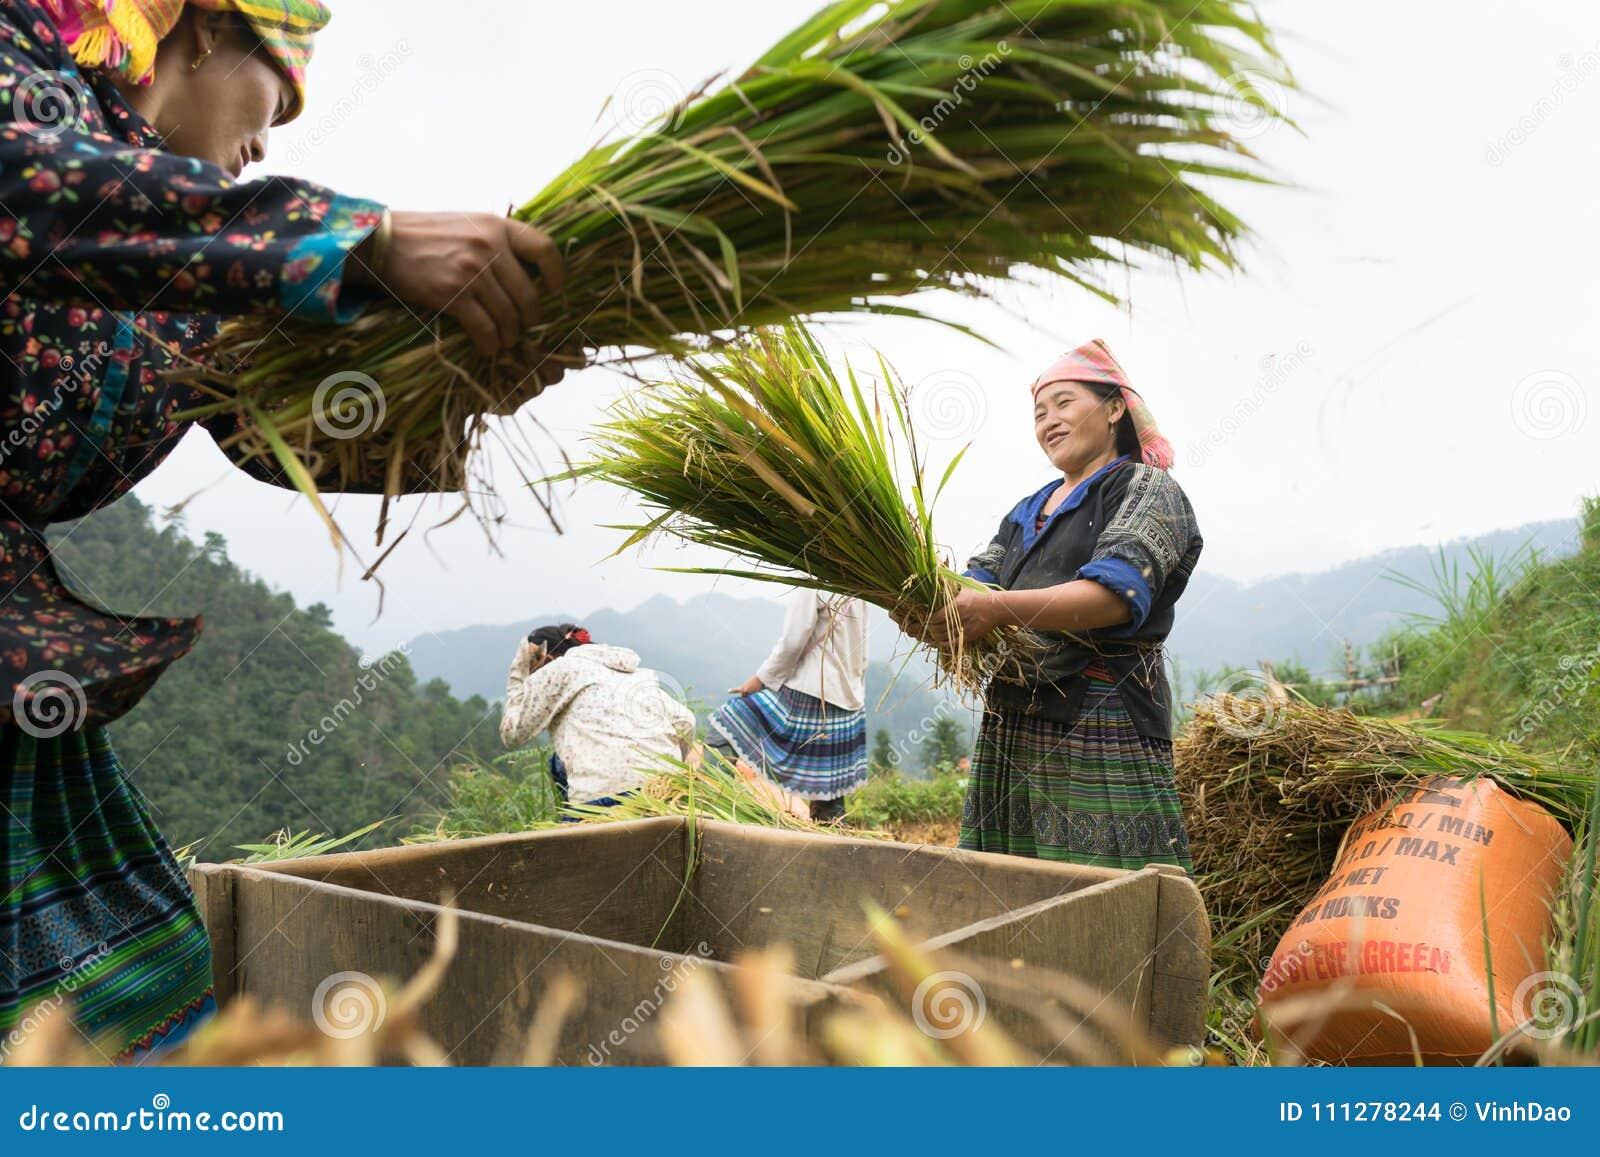 Yen Bai, Vietnam - Sep 17, 2016: Vietnamese ethnic minority woman threshing paddy on terraced field in harvesting time in Mu Cang